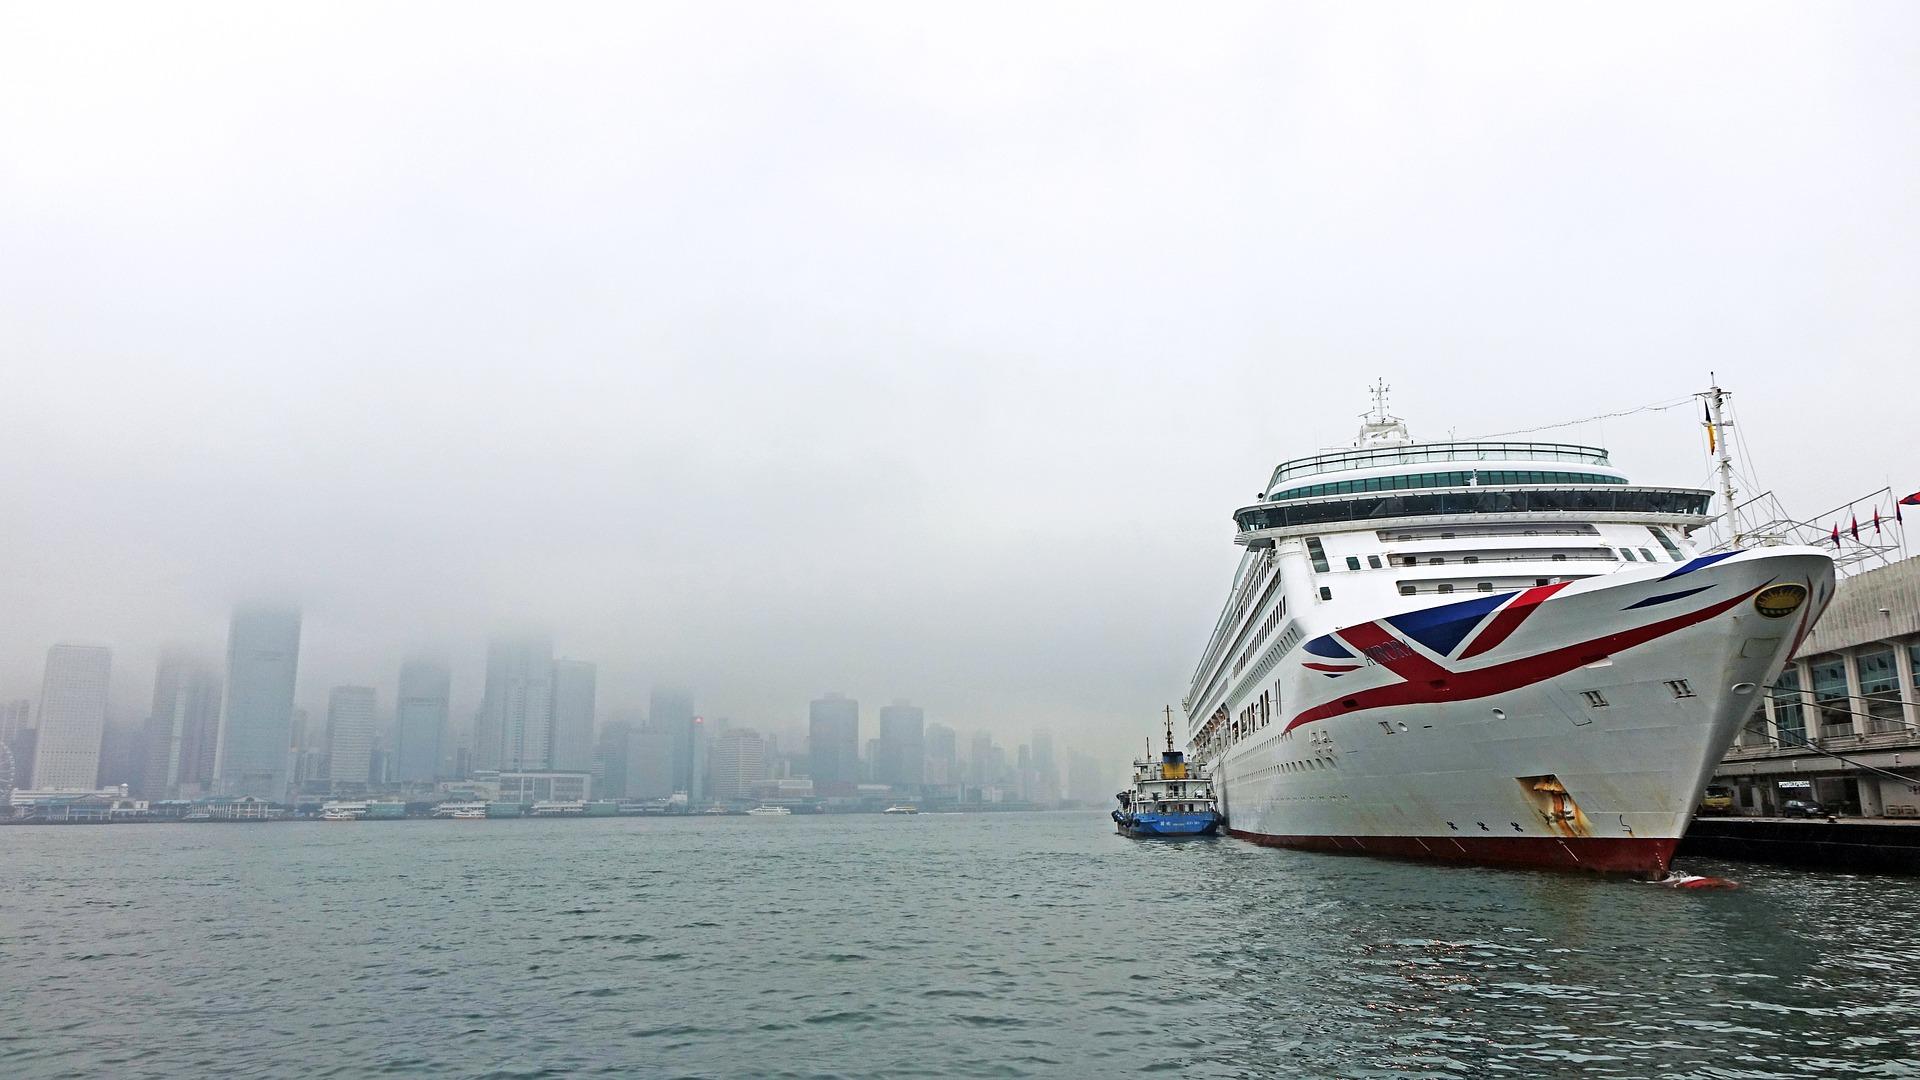 Victoria harbor photo